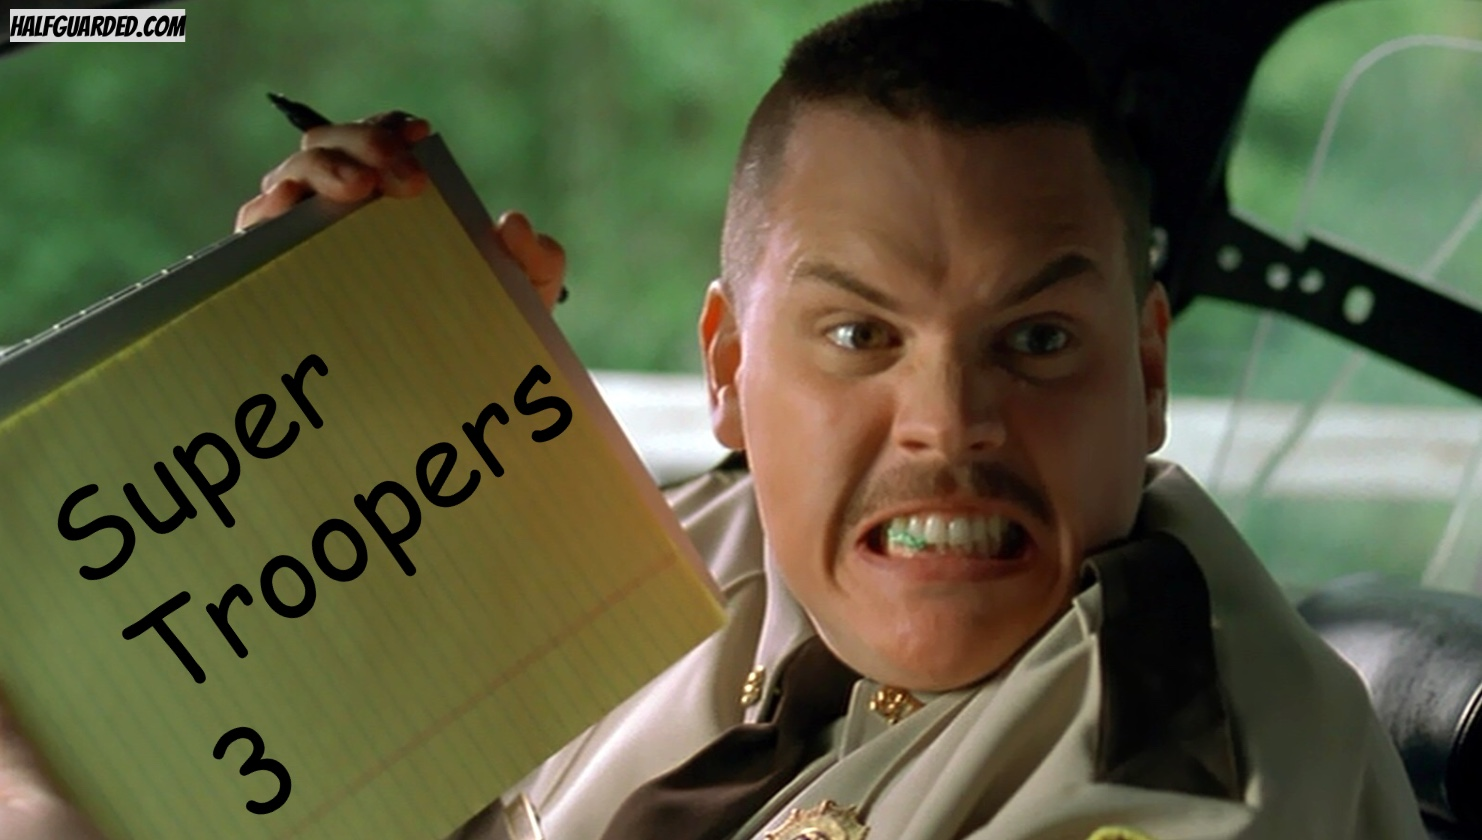 Super Troopers 3 RUMORS cast plot